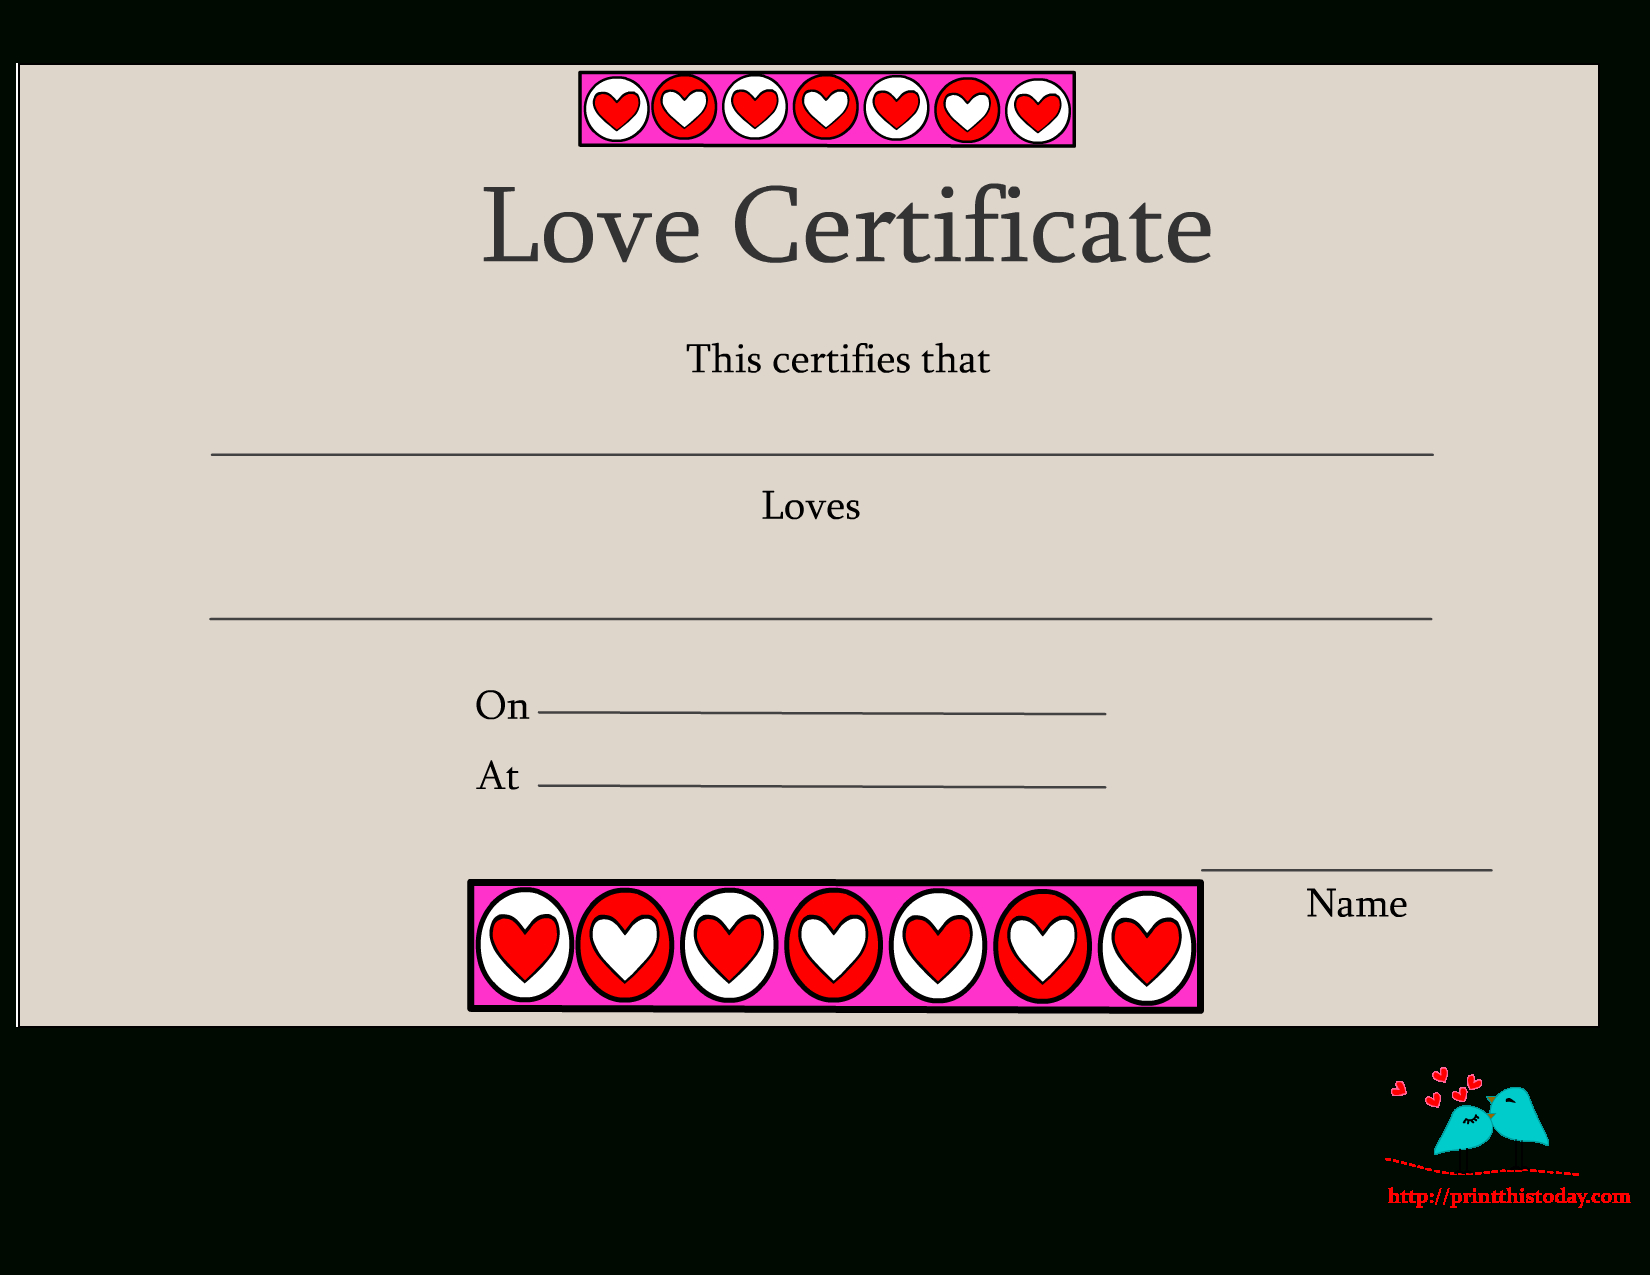 Free Printable Love Certificates - Free Printable Love Certificates For Him